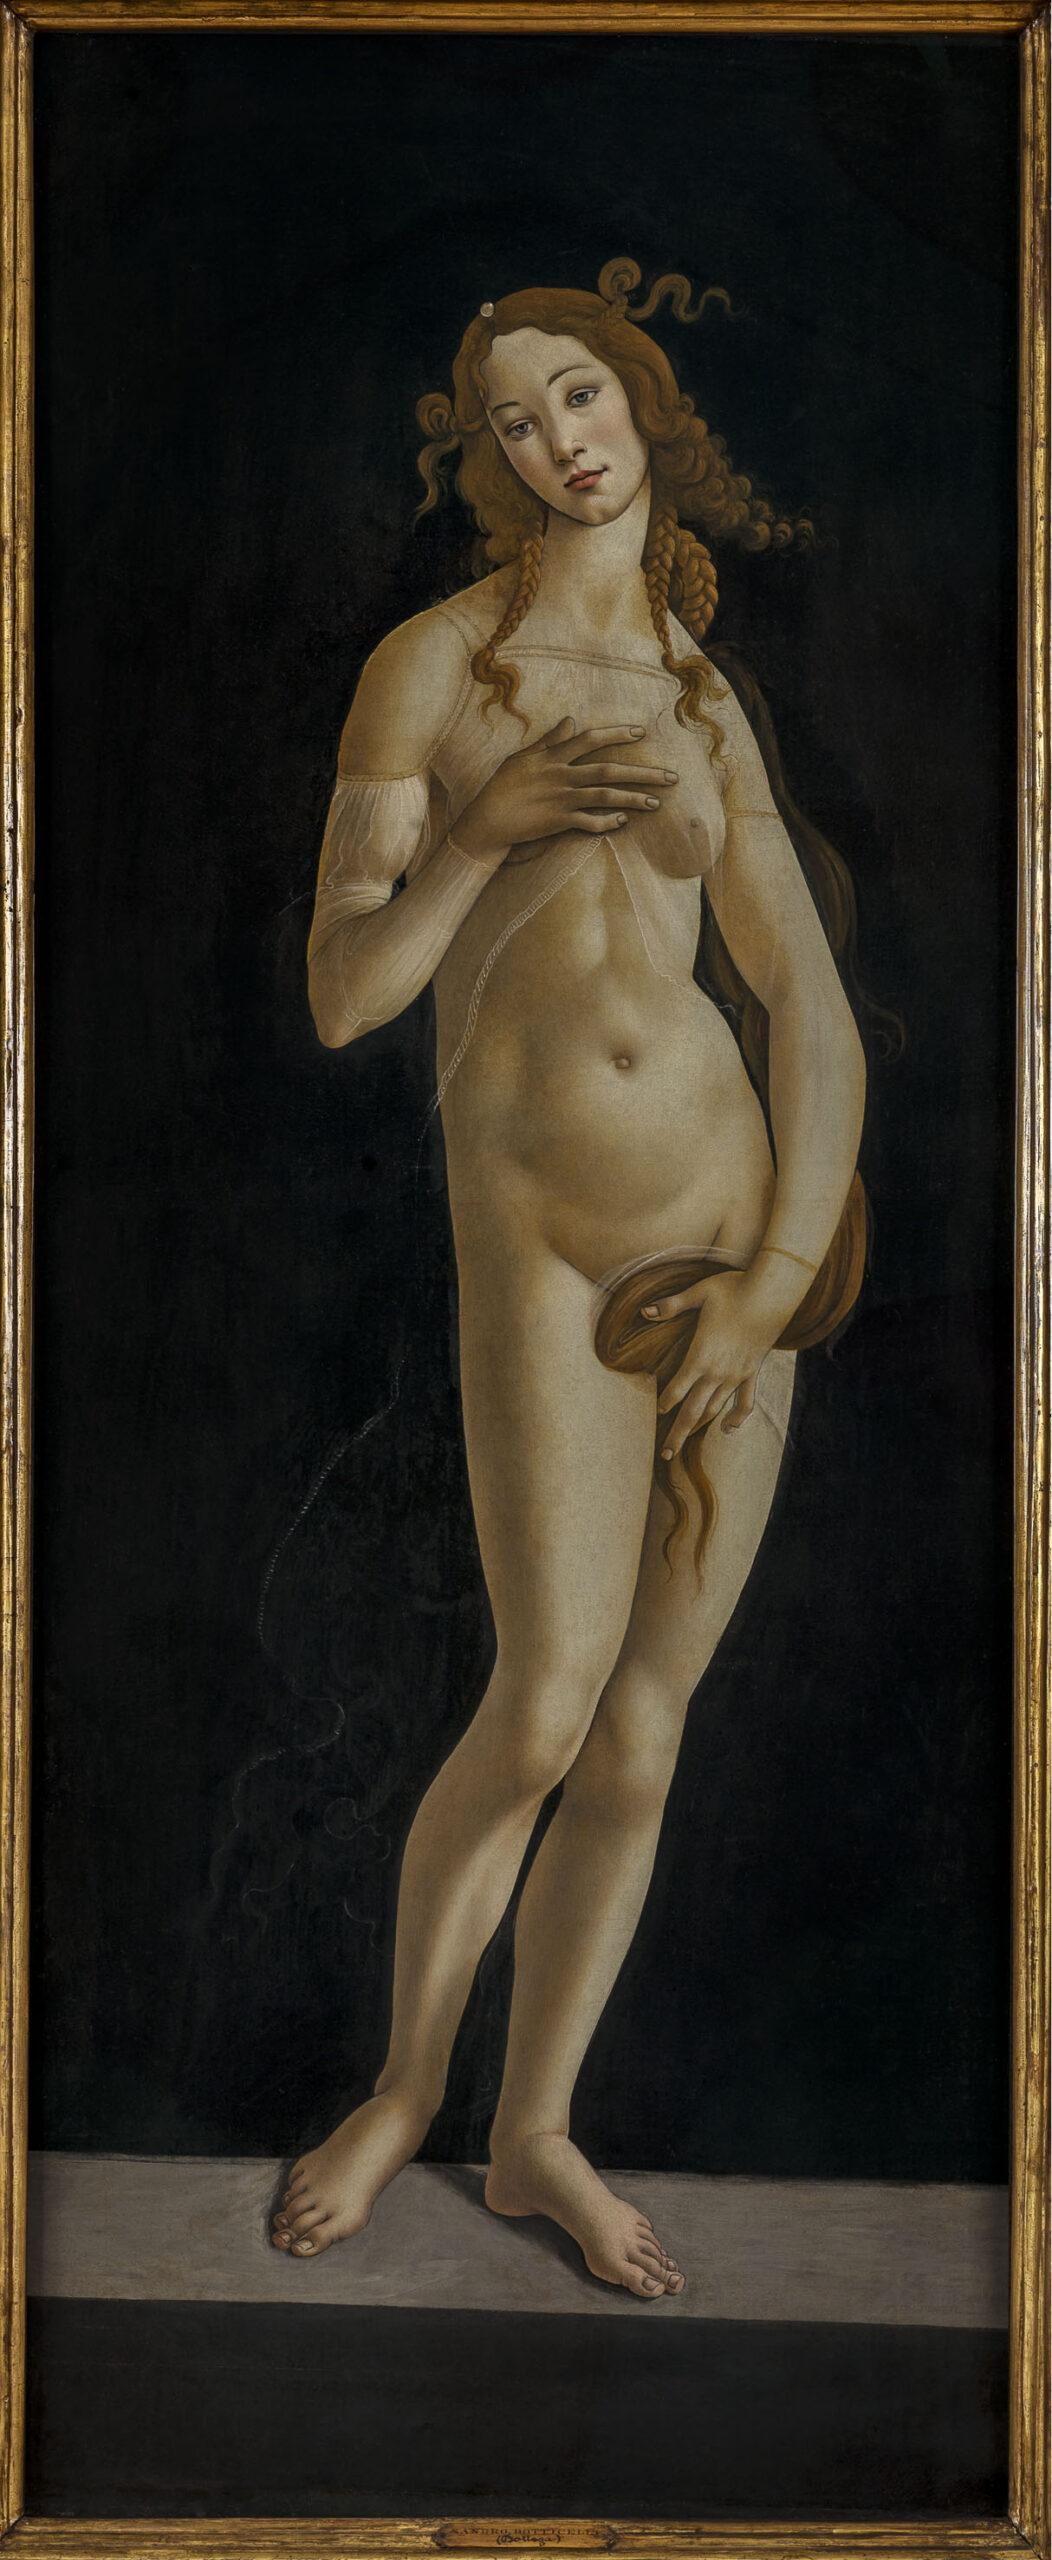 Sandro Botticelli, Venere, 1495-1497 c. © MiC - Musei Reali, Galleria Sabauda